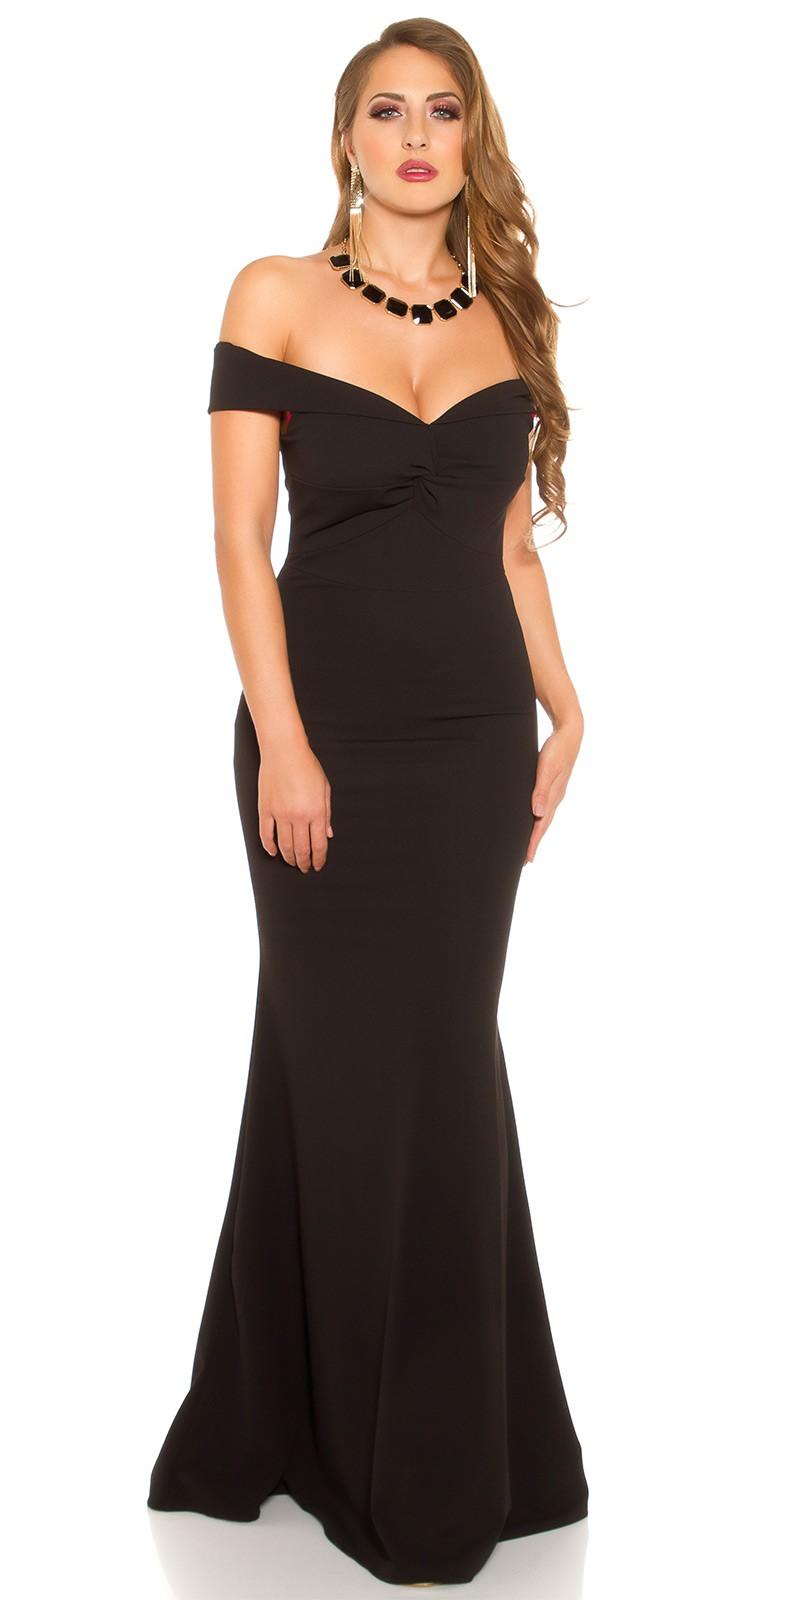 a260c204219d eeRedCarpetLook Evening Gown off shoulder  Color BLACK Size Einheitsgroesse 0000K6039 SCHWARZ 23